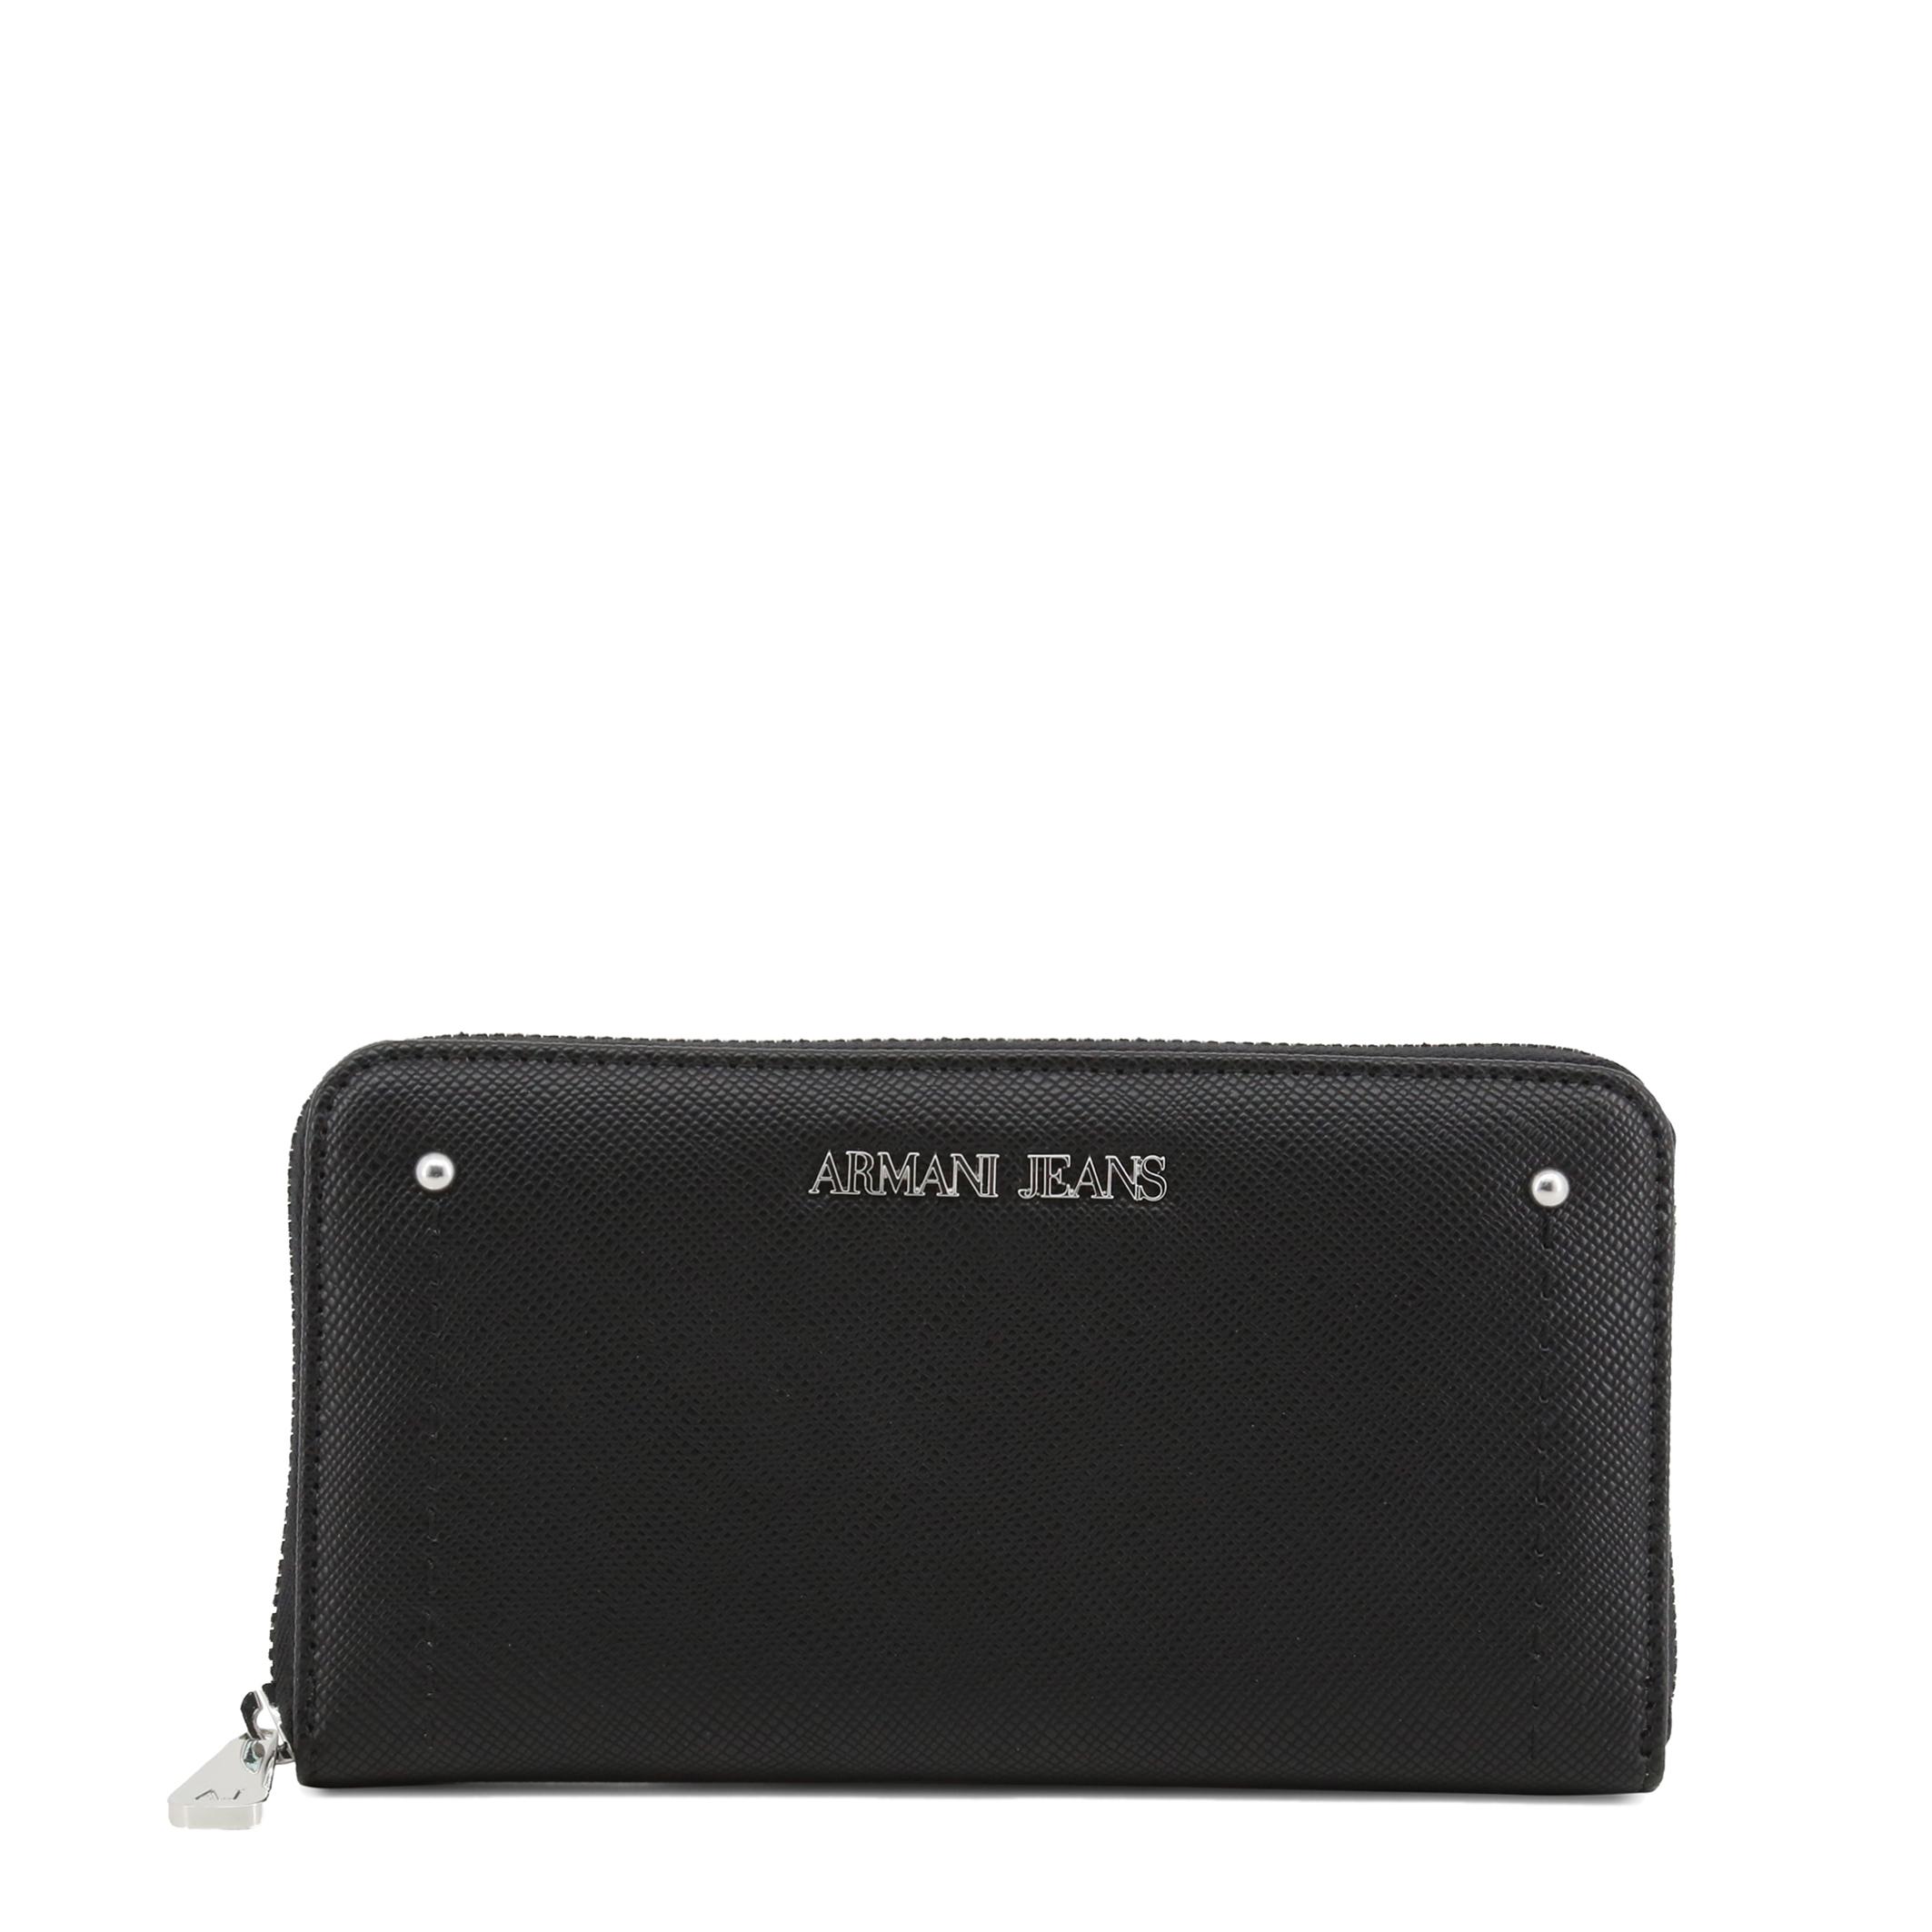 Armani Jeans 928032 CD756